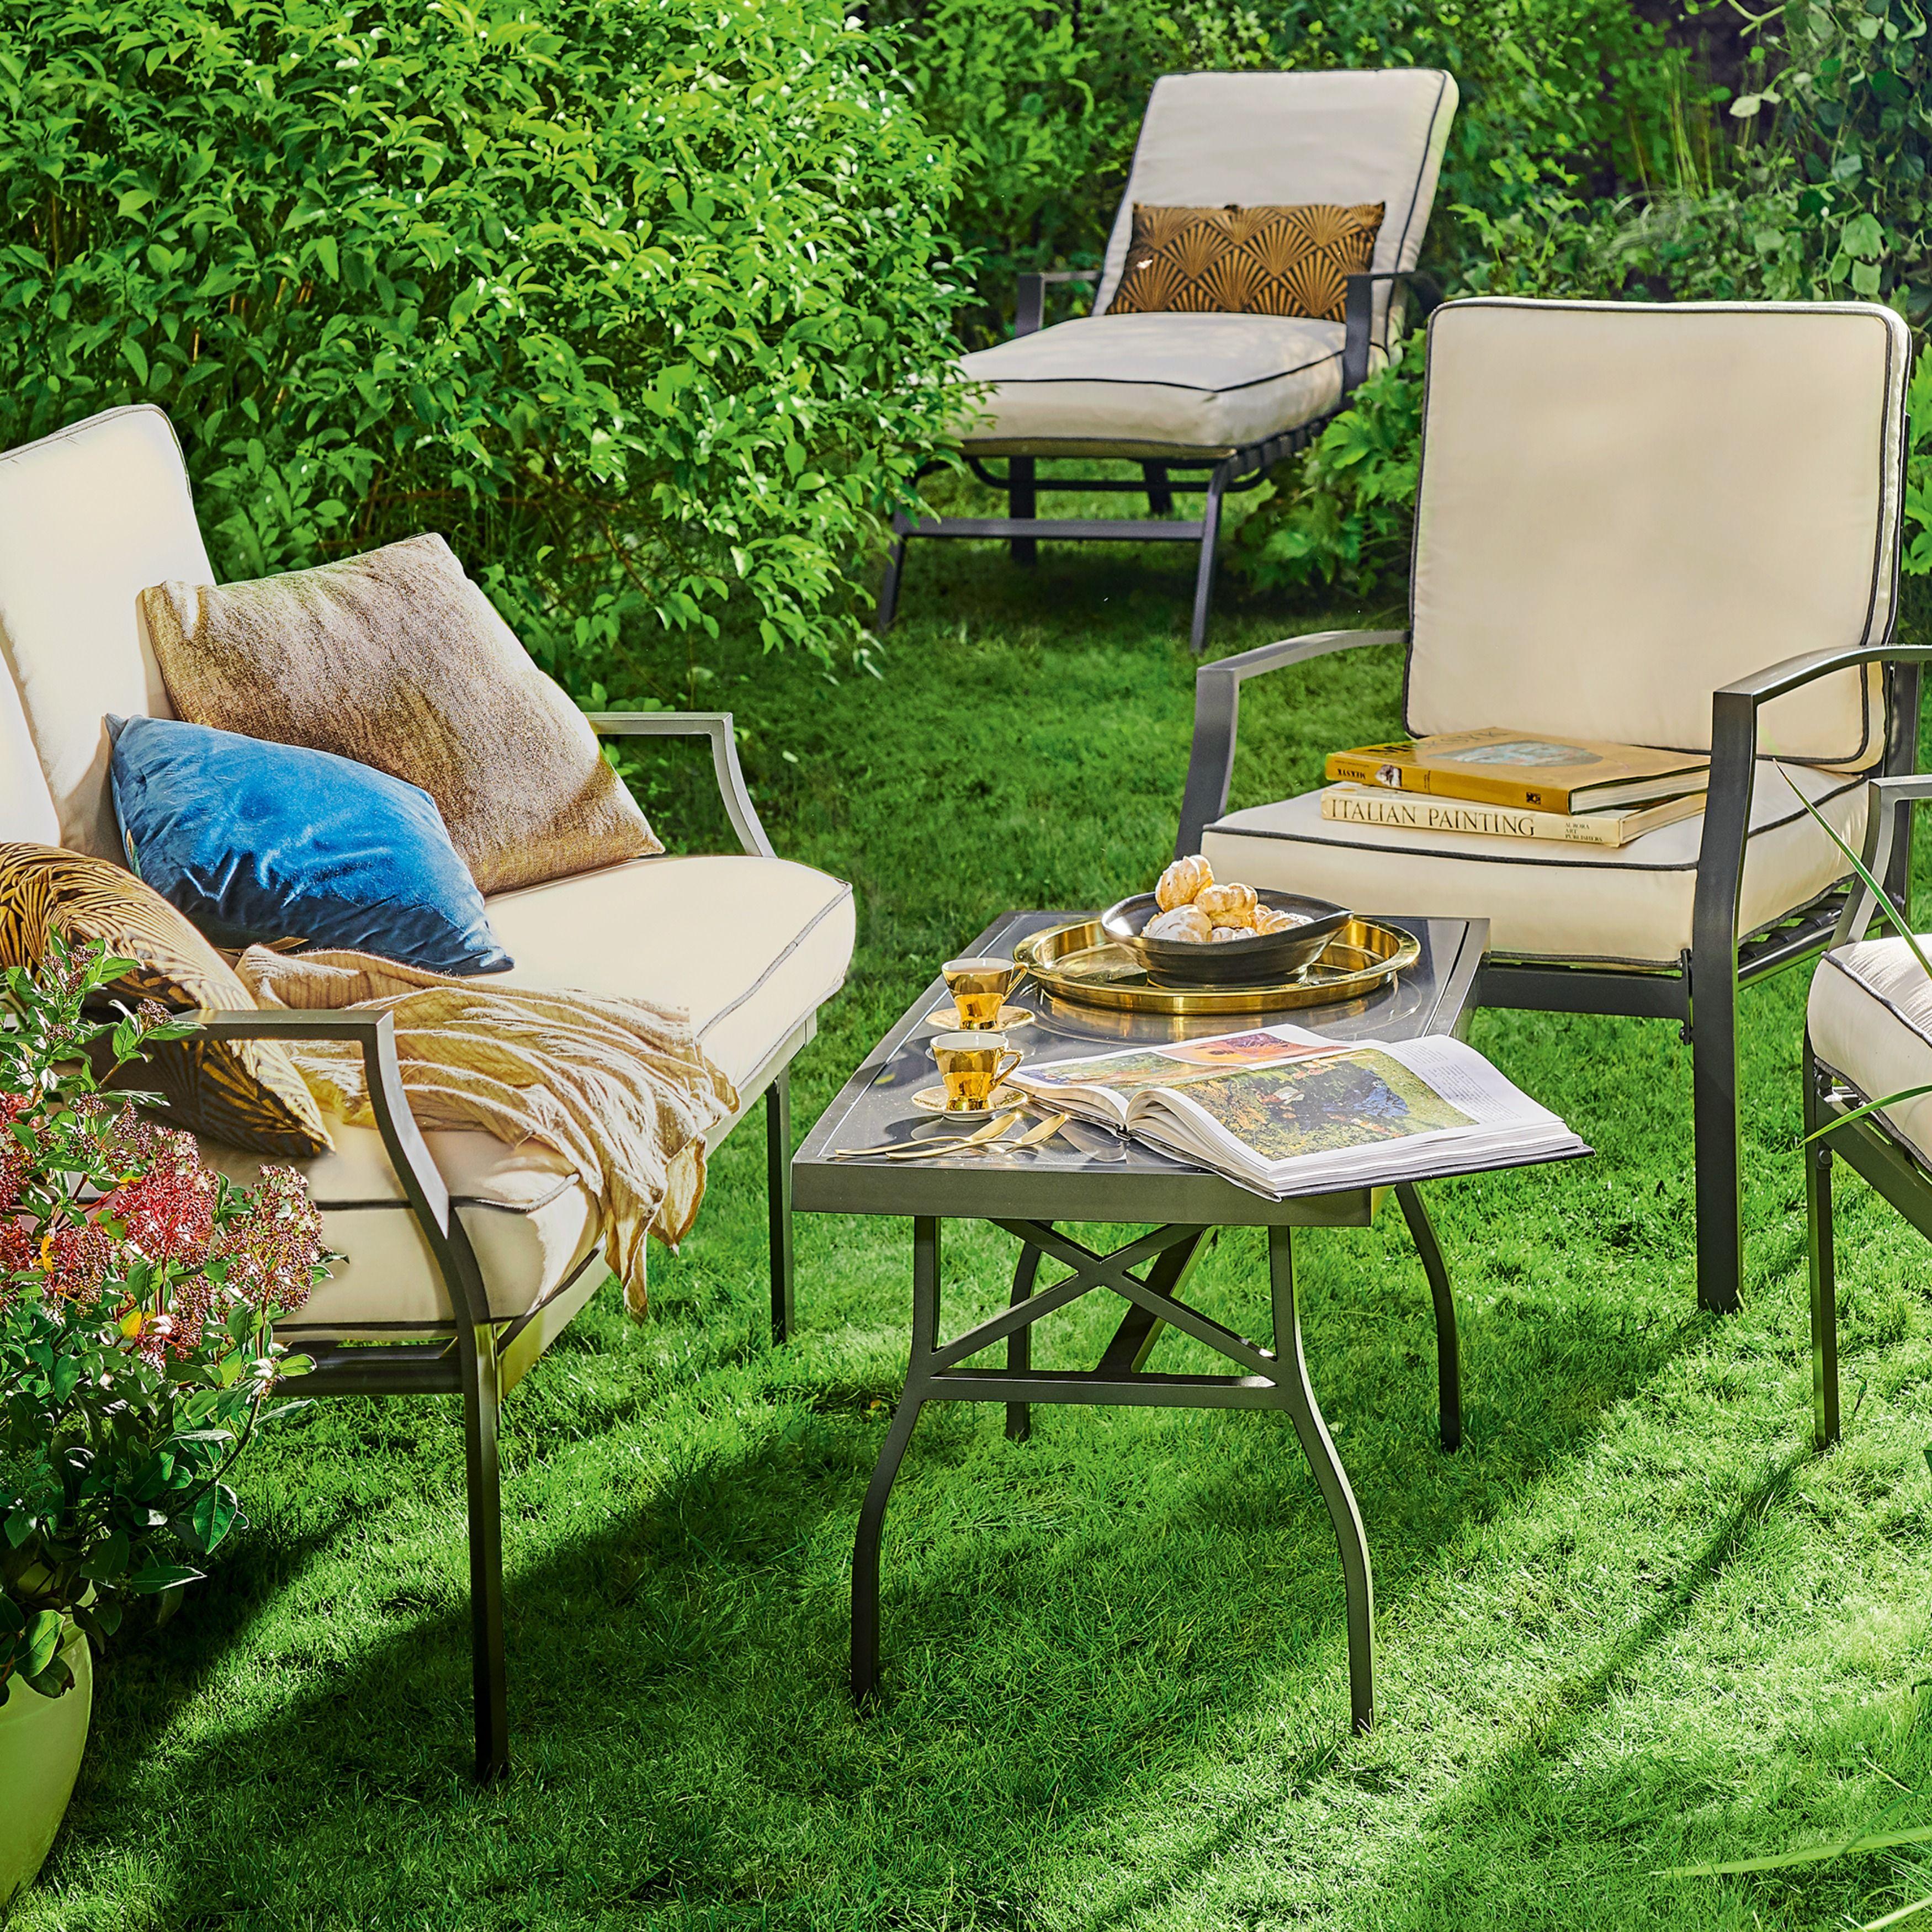 Leroymerlin Leroymerlinpolska Dlabohaterowdomu Domoweinspiracje Ogrod Taras Mebleogrodowe Wypocz Outdoor Furniture Outdoor Decor Outdoor Furniture Sets